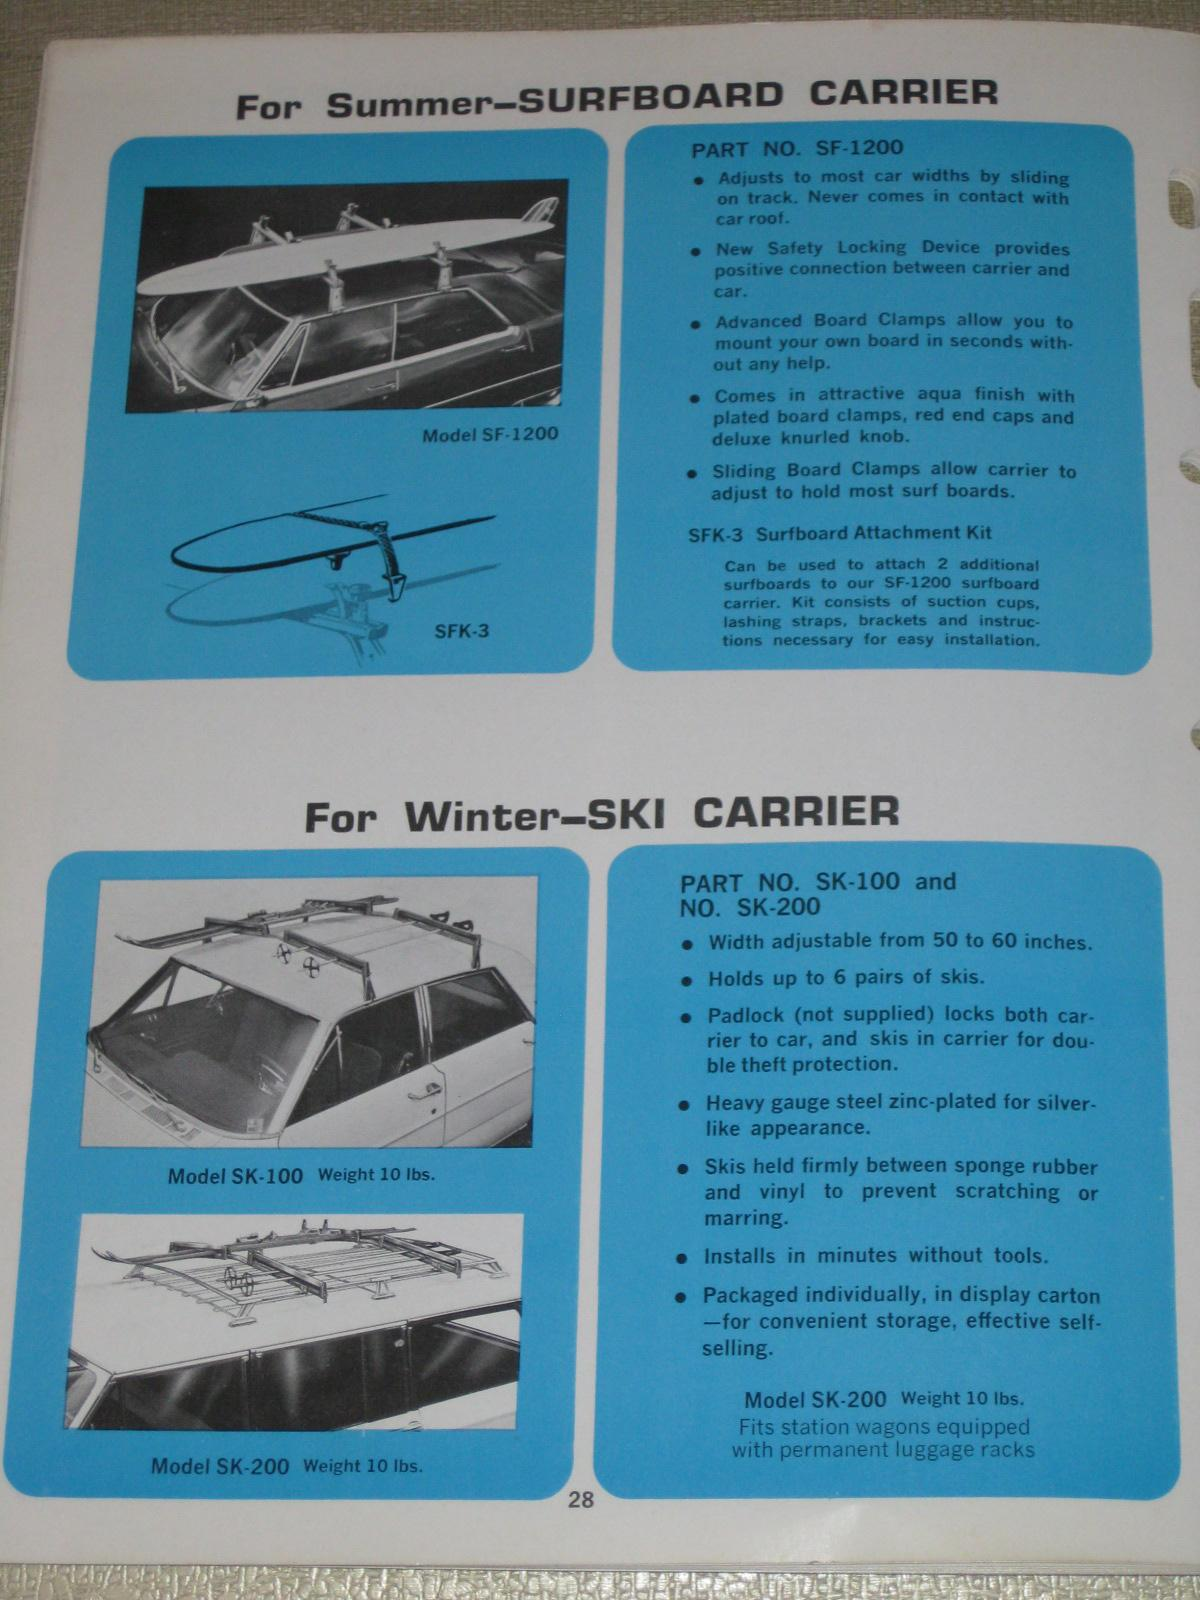 FOXCRAFT VW Accessories Catalog 1970